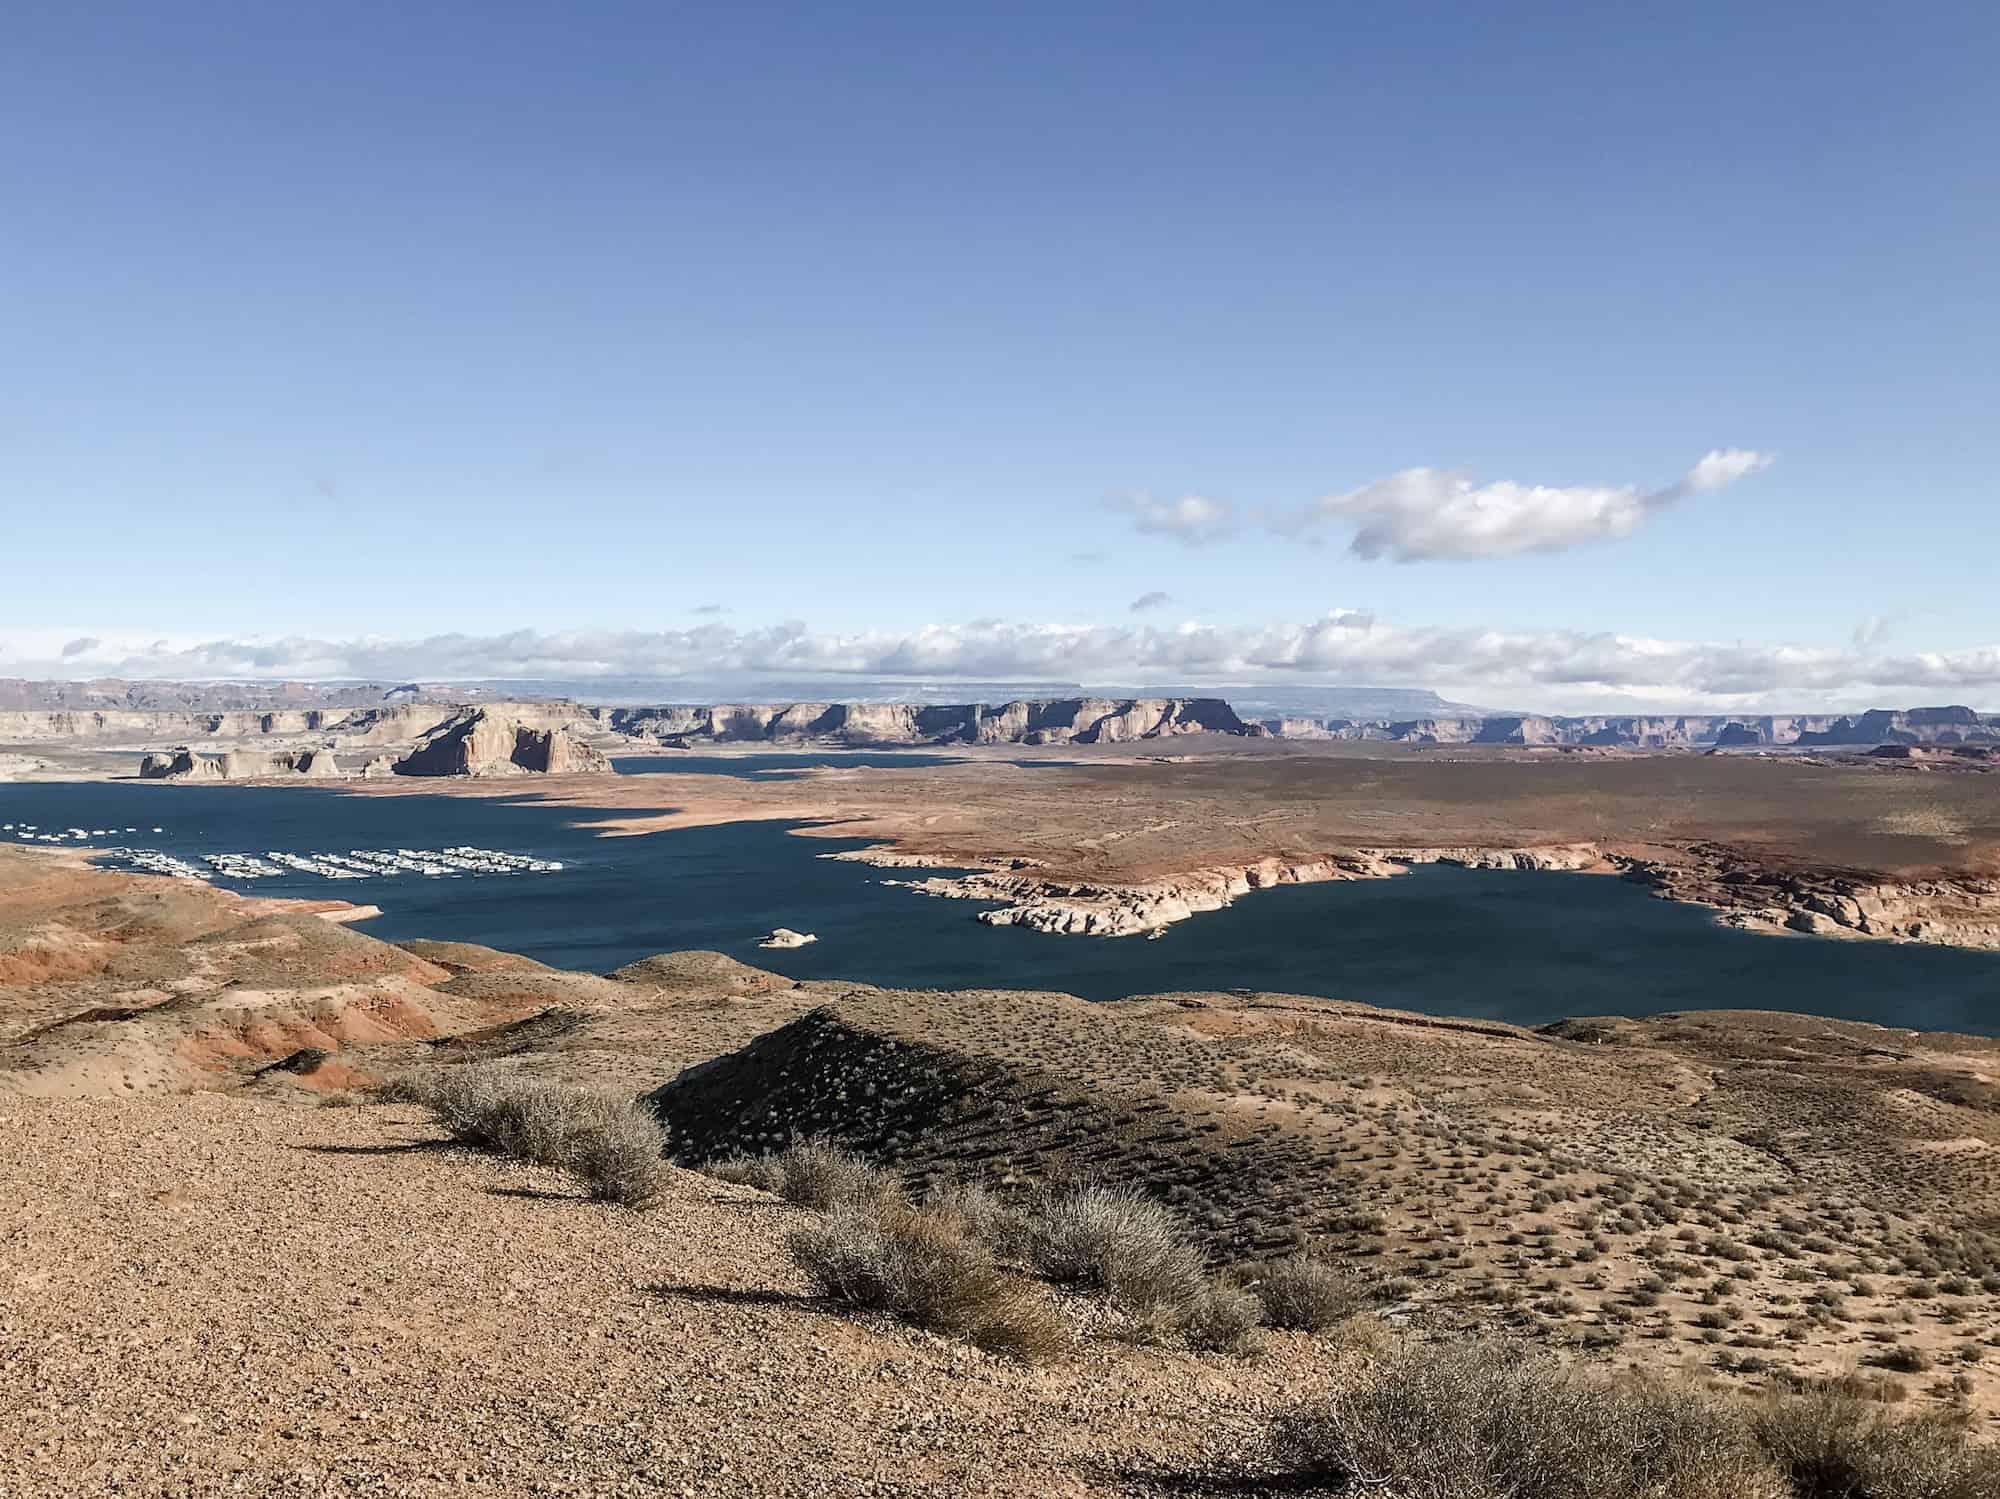 A scenic look at Lake Powell, Arizona